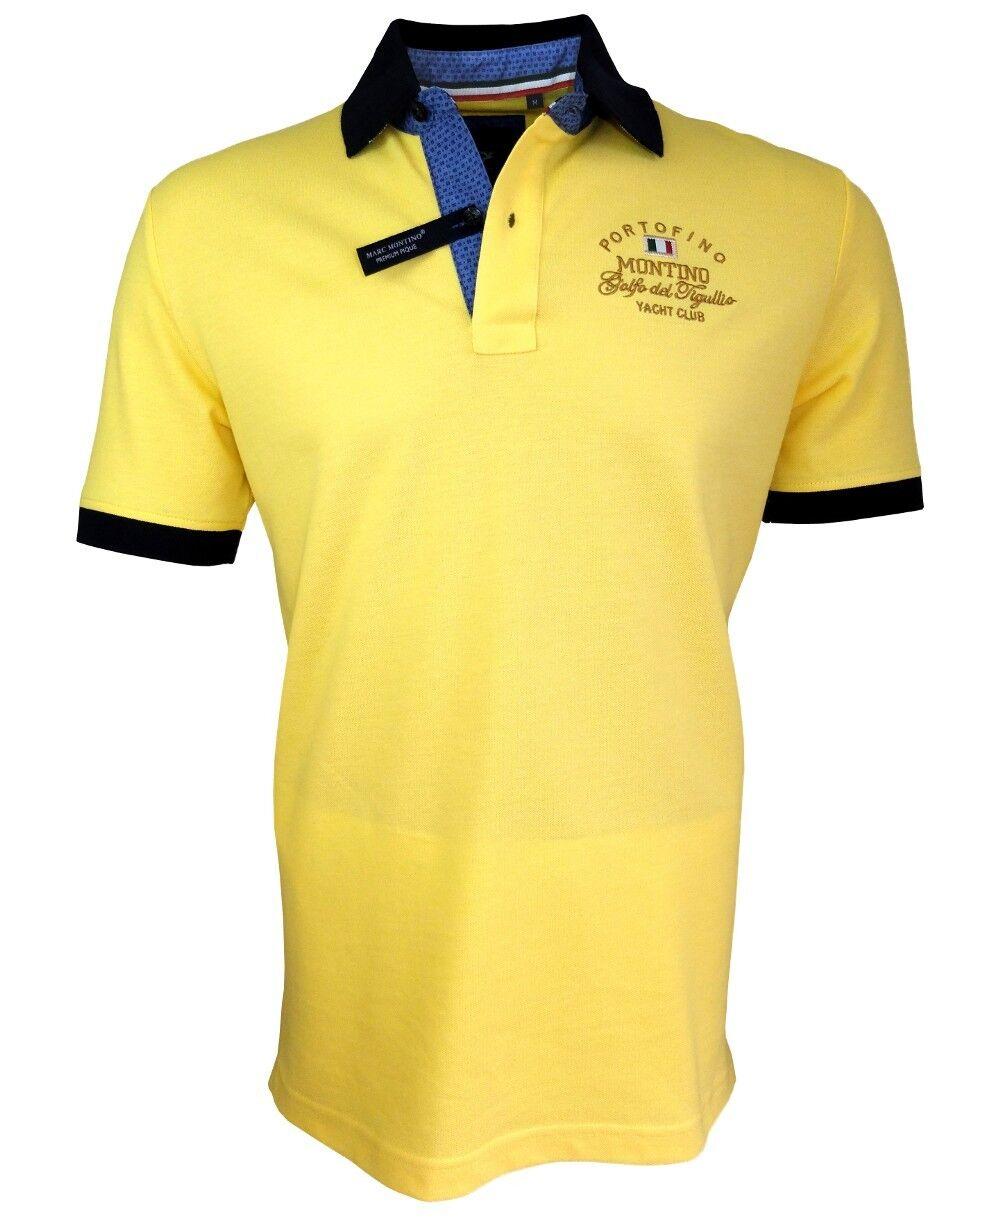 Marc  montino señores camiseta polo amarillo marine talla L XL piquè Premium  apresurado a ver